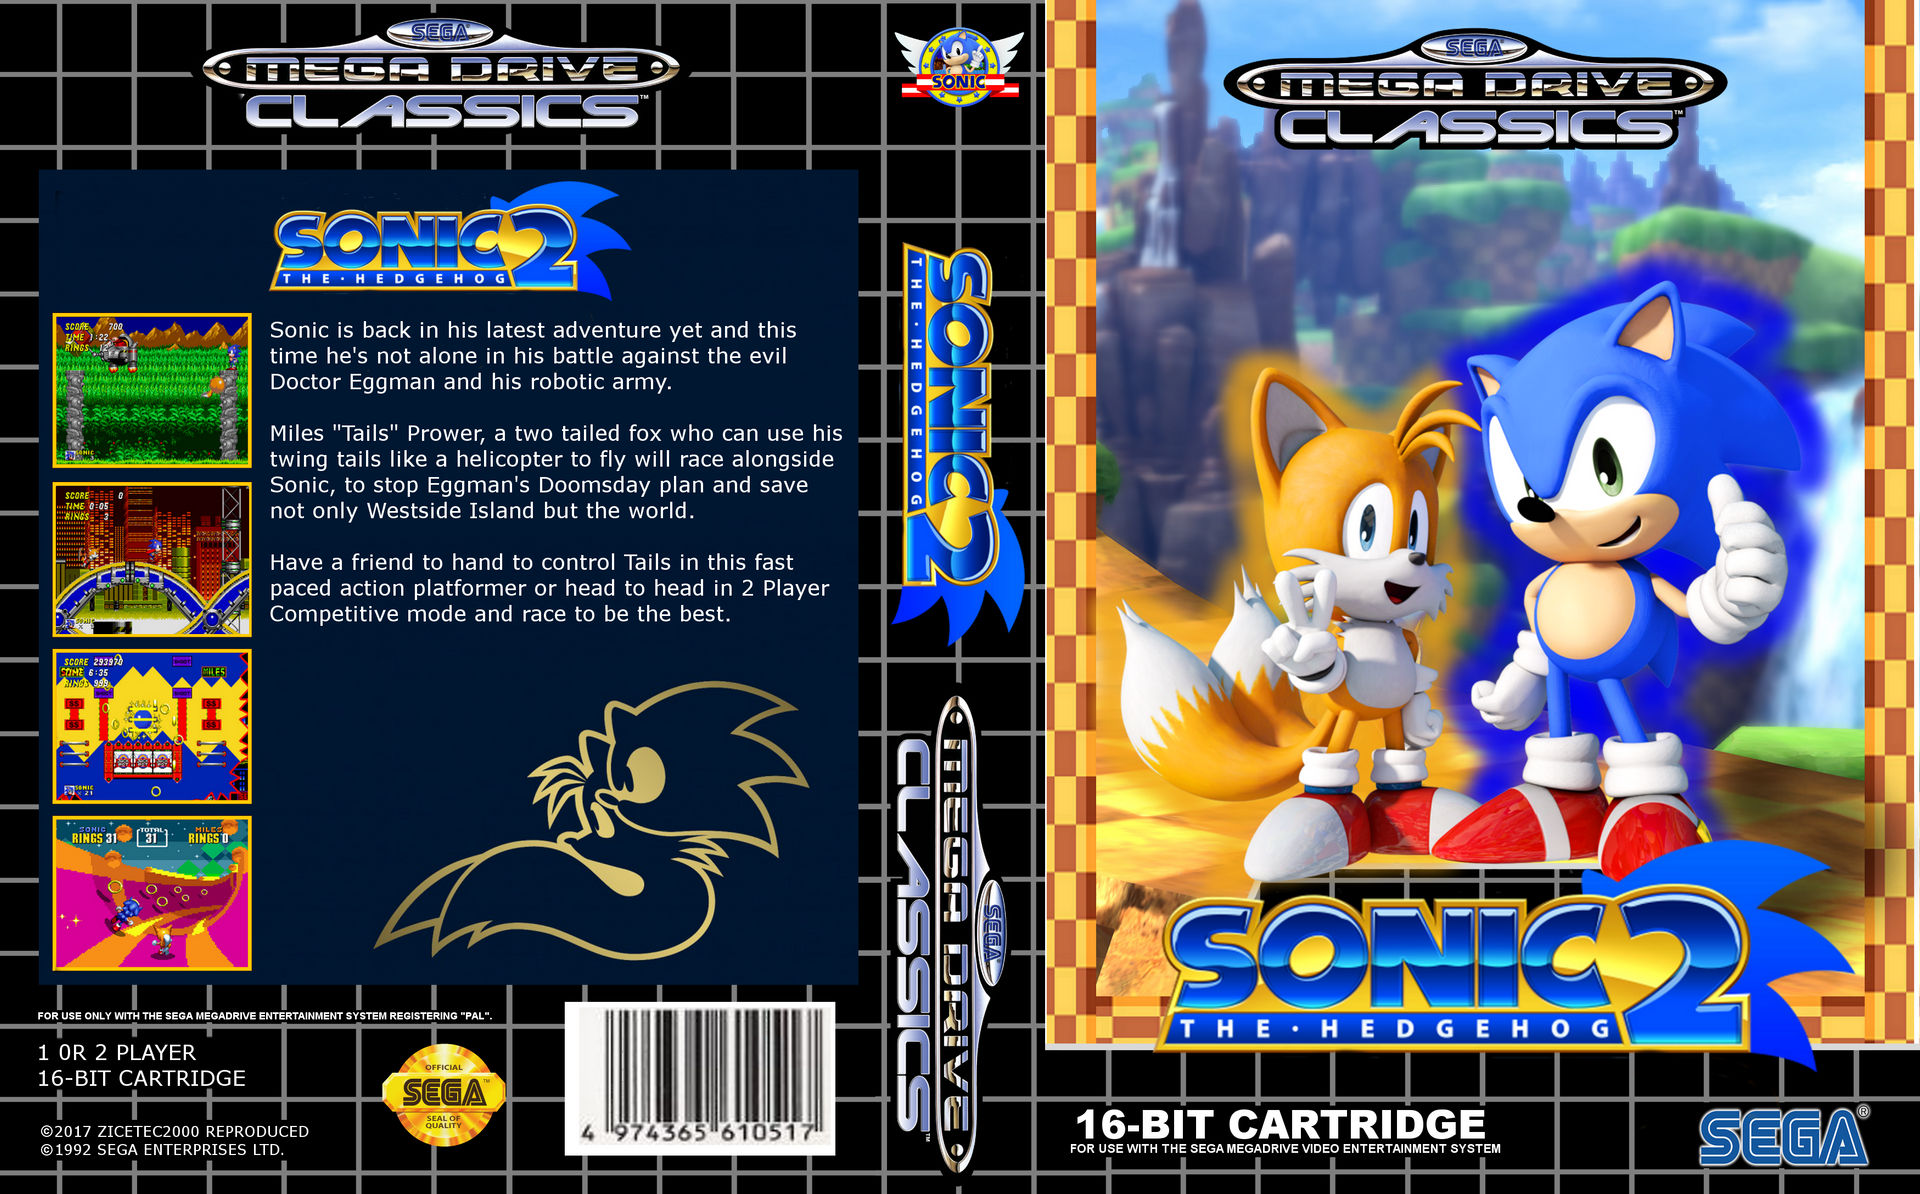 Modernized Sonic The Hedgehog 2 Mega Drive Box By Zicetec2000 On Deviantart